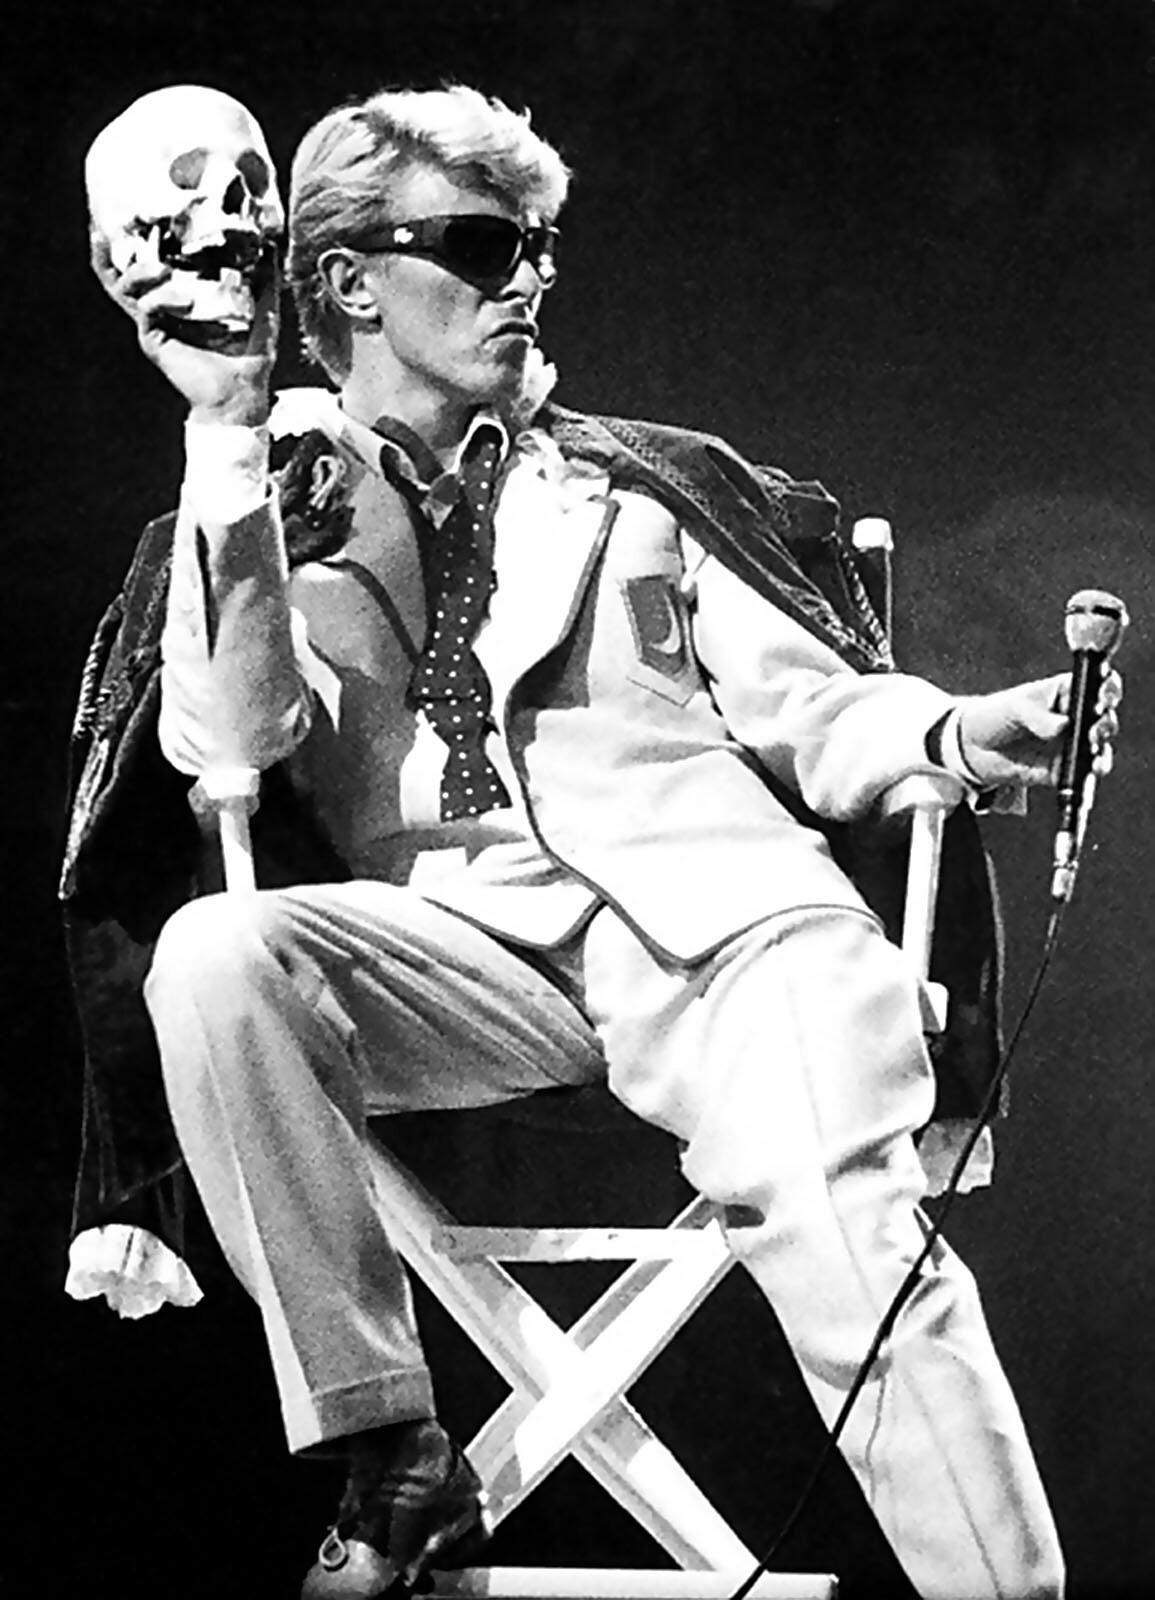 David Bowie - Music Legends